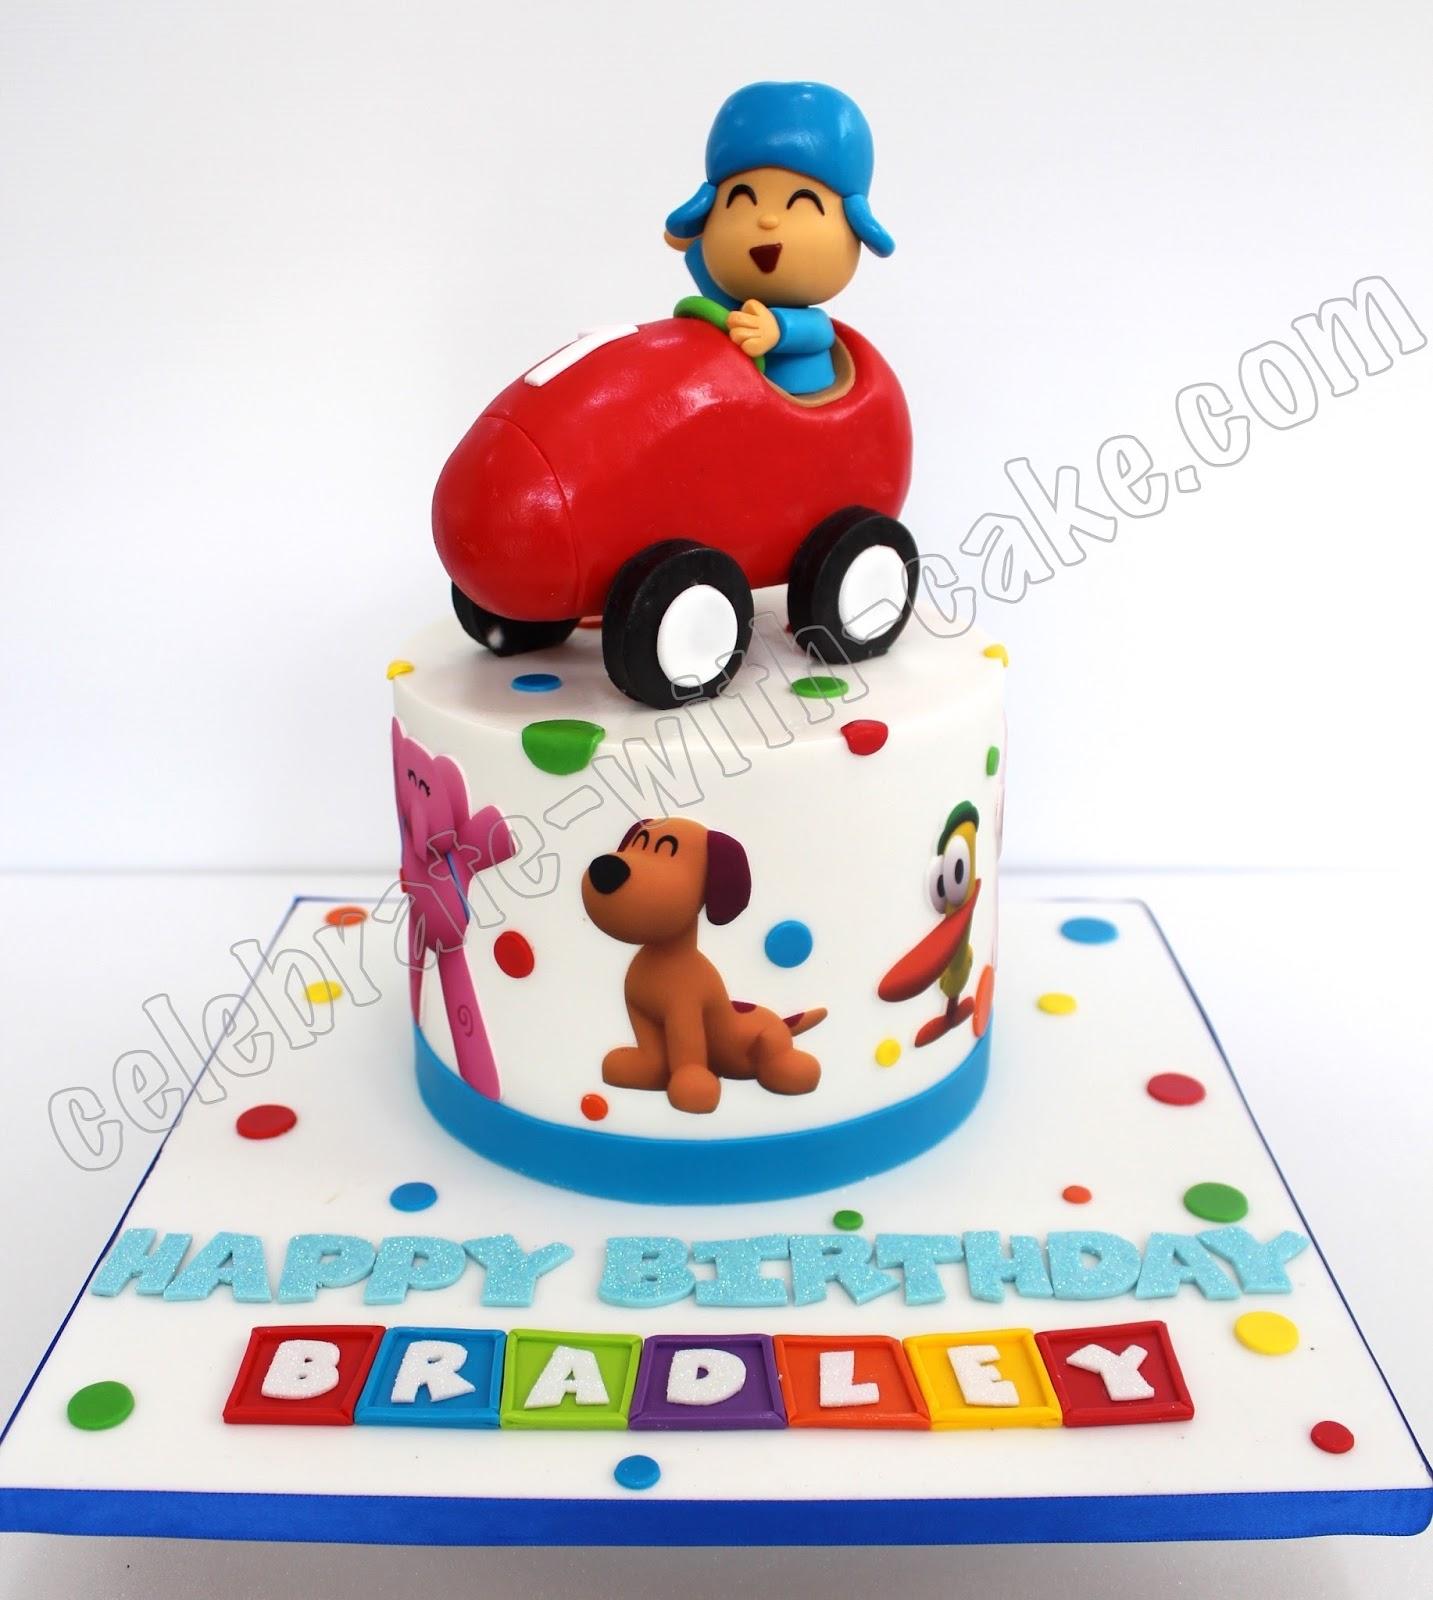 Celebrate With Cake Pocoyo In Car